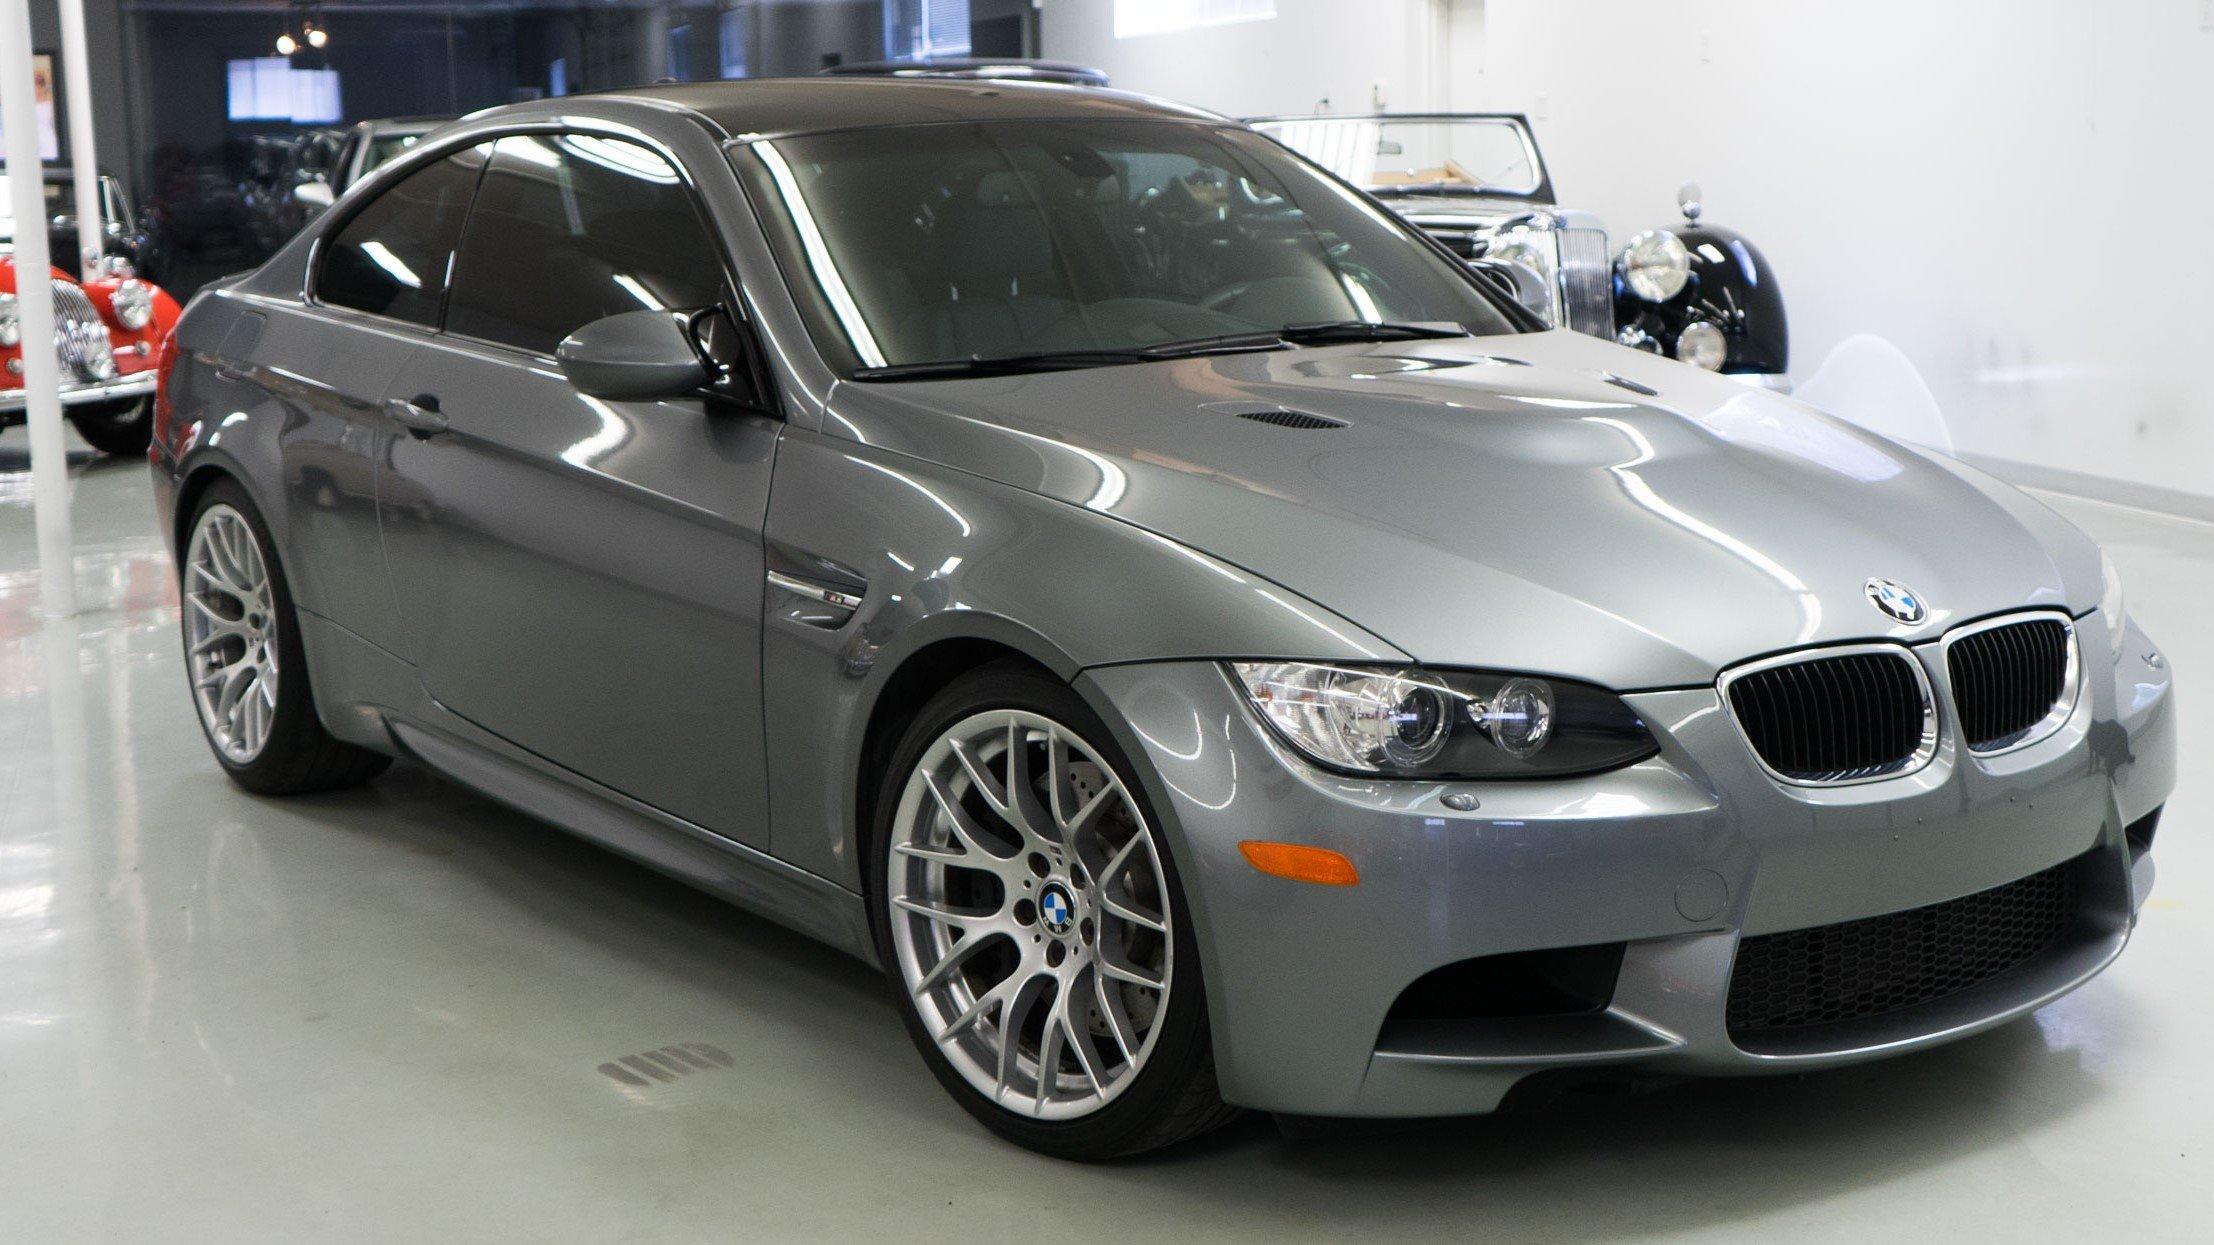 2012-BMW-M3-Gray-slideshow-003@2x2